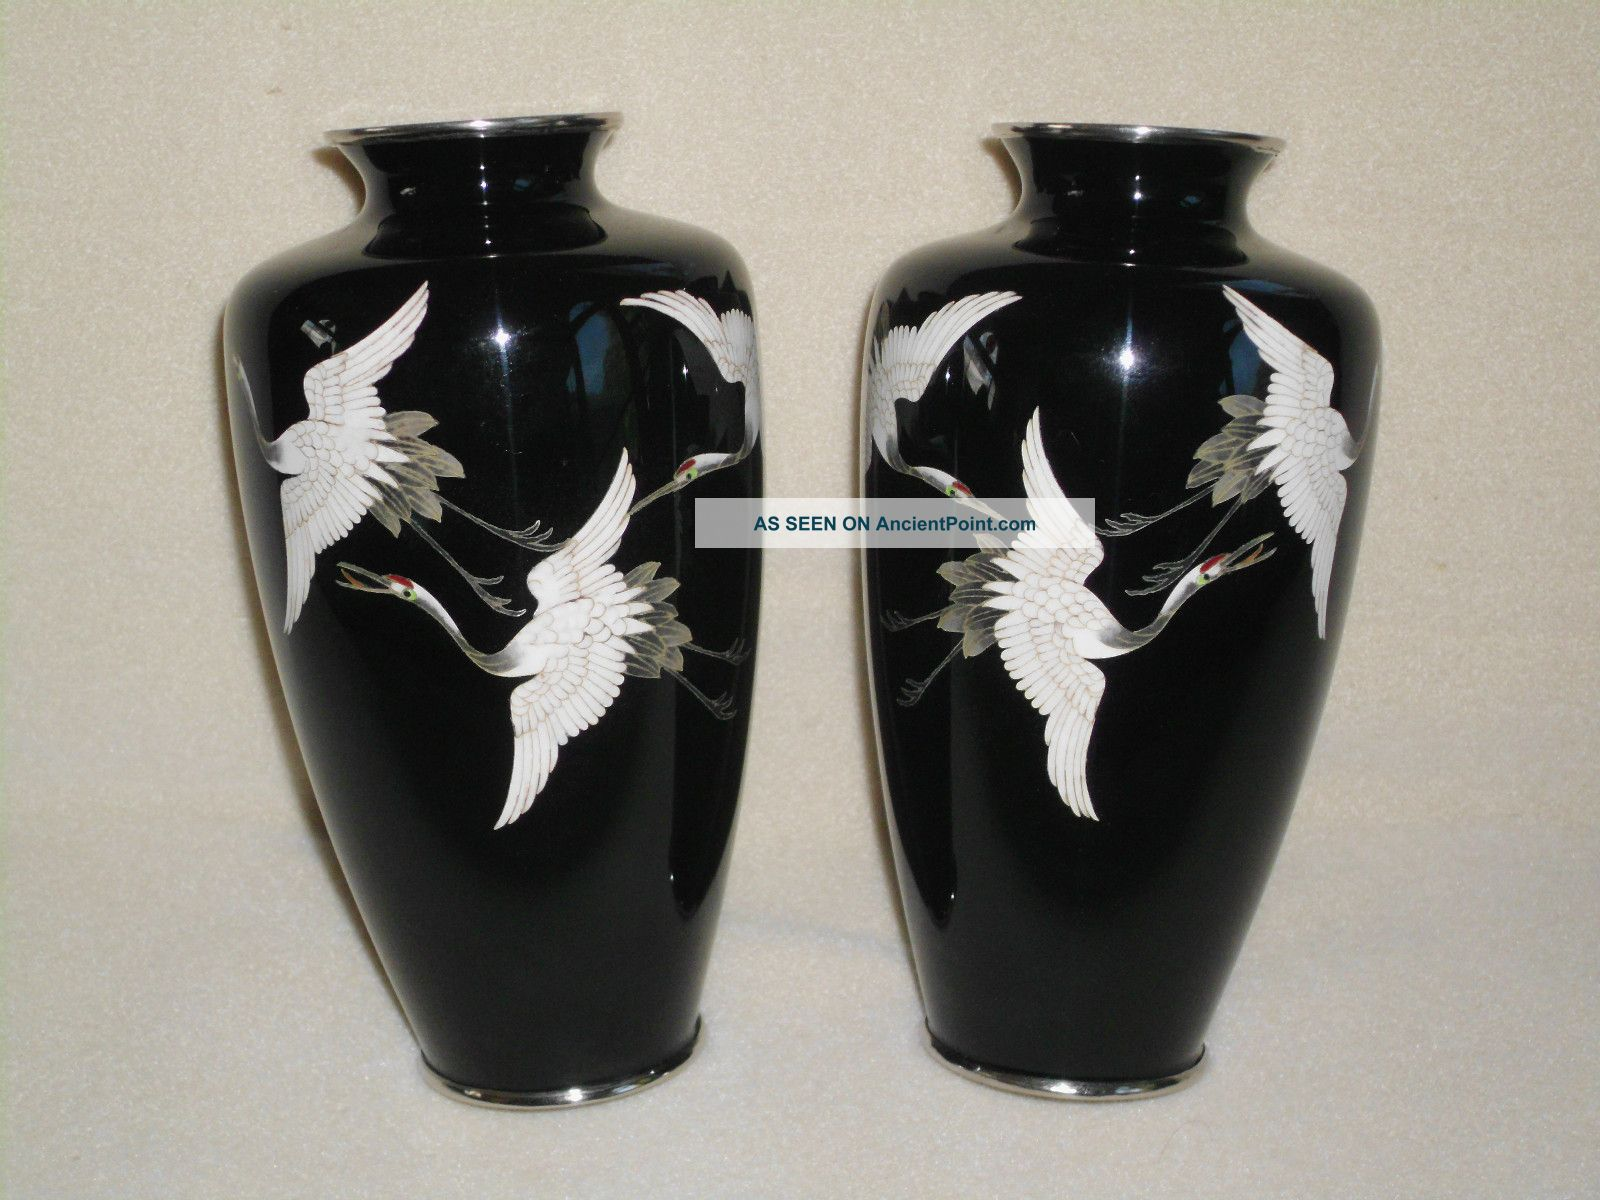 2 Vtg Black Japanese Sato Ginbari Enamel Cloisonne Vases Silver Rim Cranes Birds Vases photo